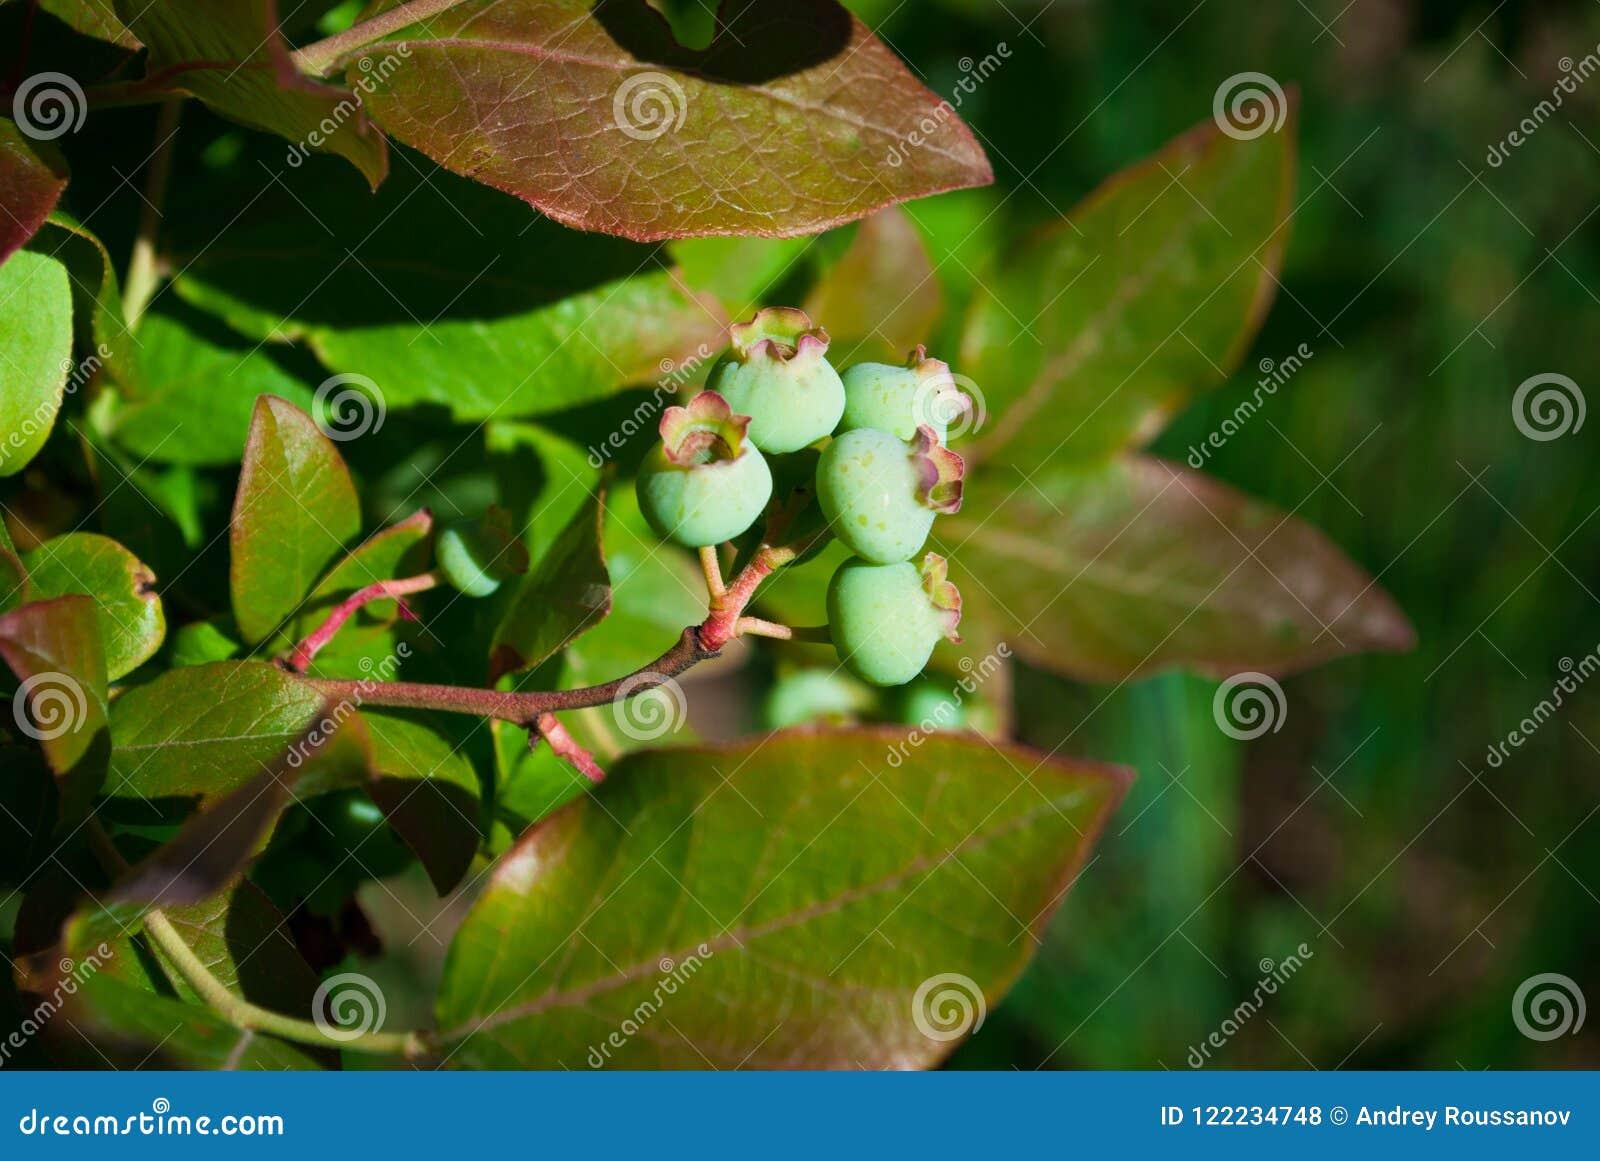 Fresh Green Organic Blueberries on the bush. close up